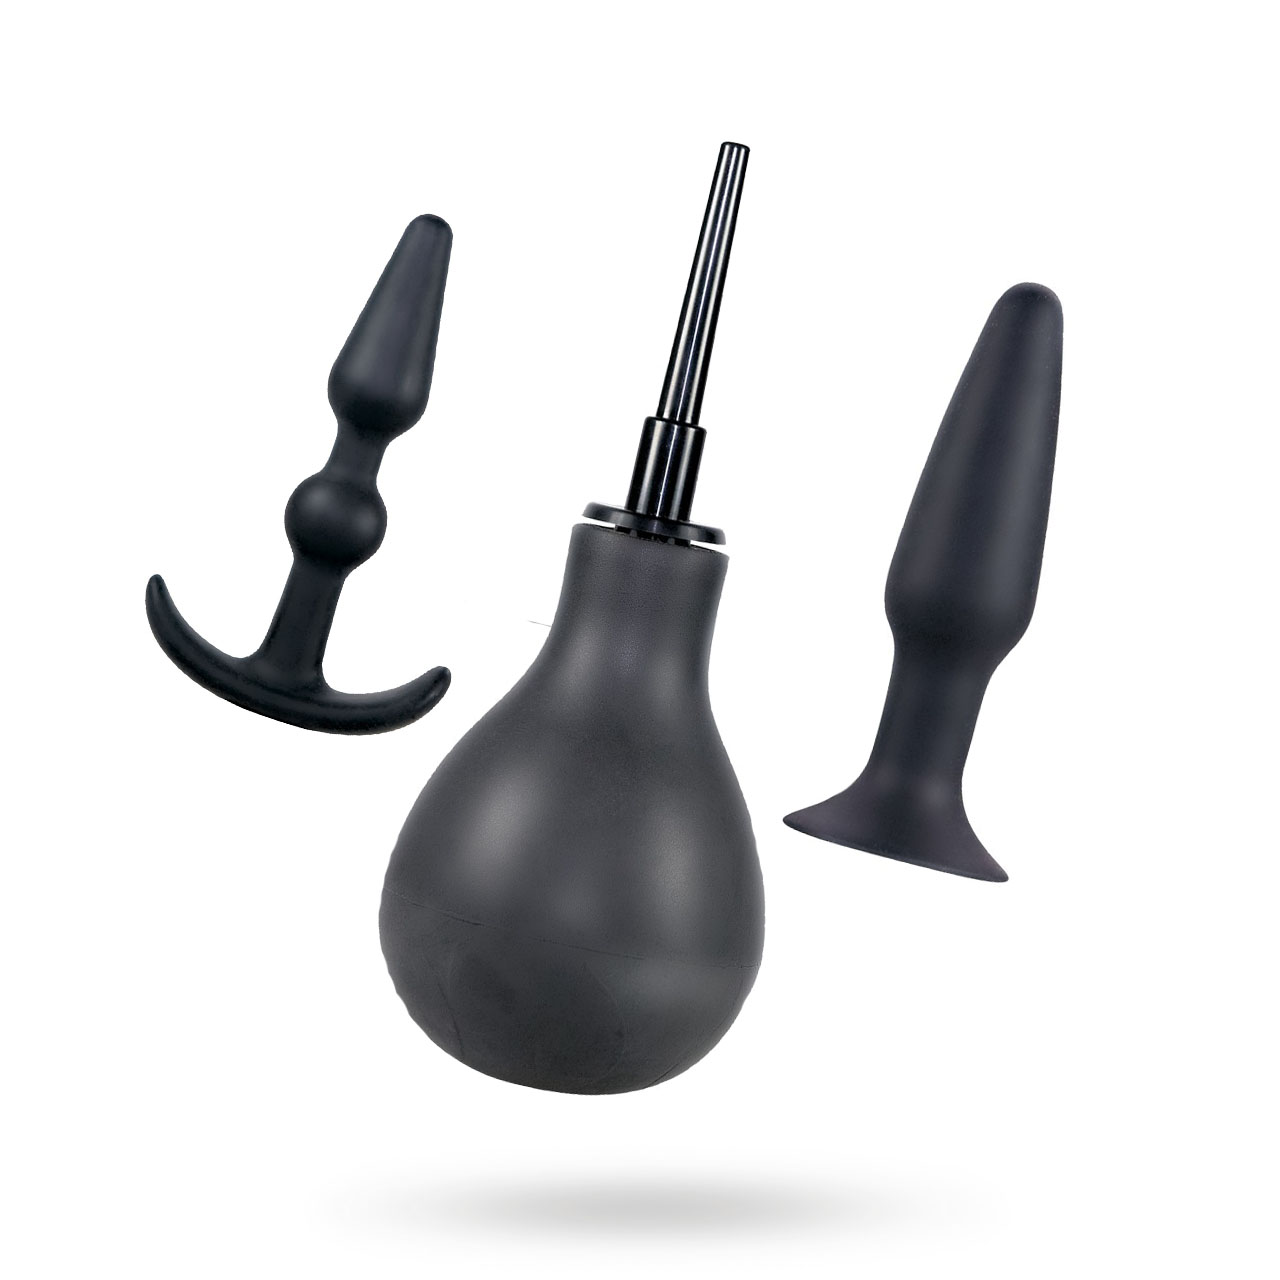 Anal Playbox - Rengörning, Liten Plugg och en Vibrerande Plugg | SEXLEKSAKER, ANALT - UNISEX, Analleksaker i set, Analhygien, Brands, You2Toys | Intimast.se - Sexleksaker